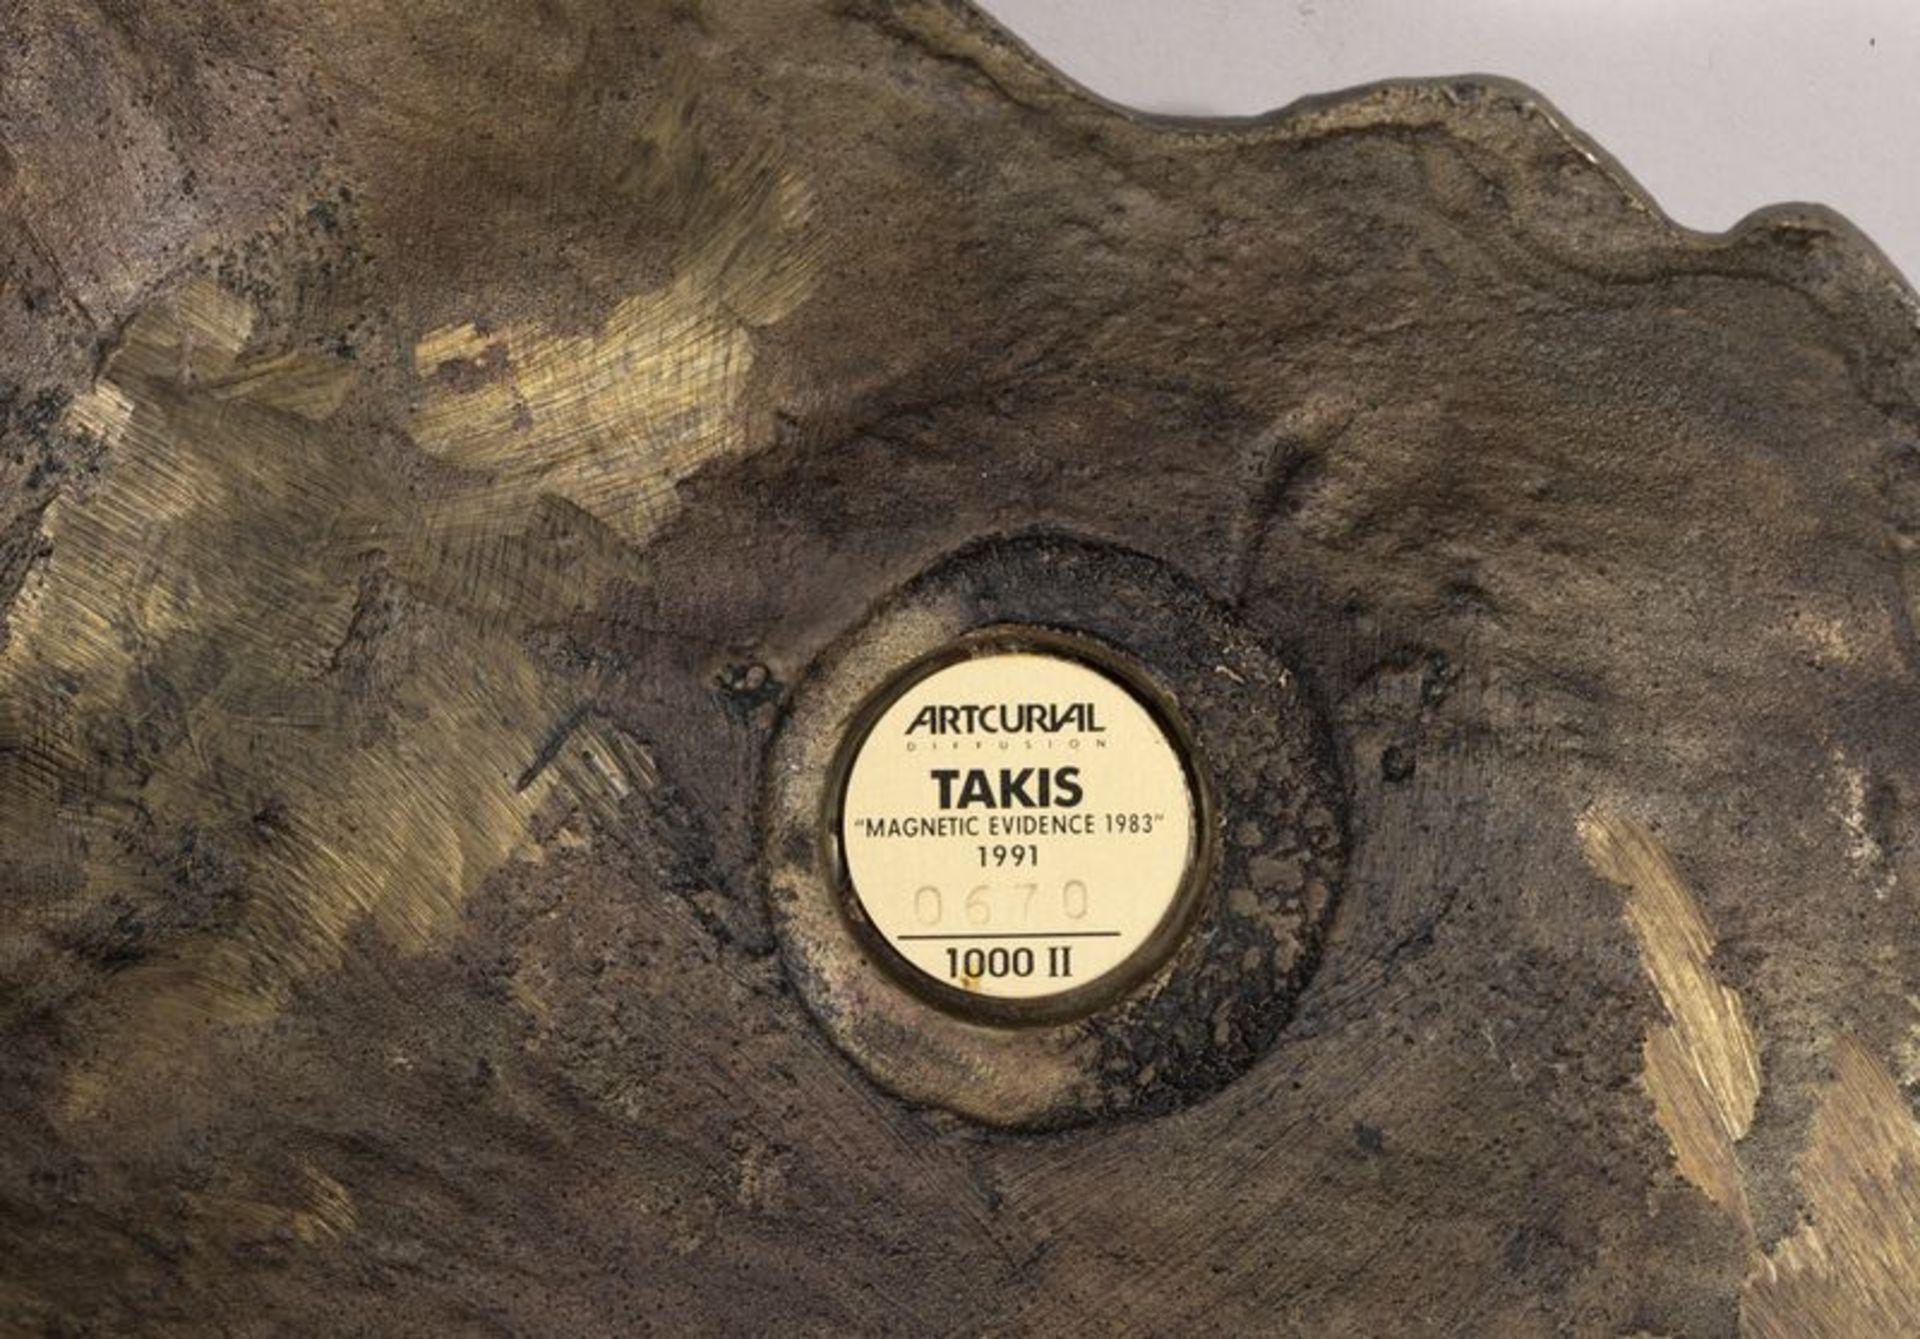 Los 35 - VASSILAKIS TAKIS (NE EN 1925) MAGNETIC EVIDENCE, 1983 -1991 Bronze à patine dorée, [...]